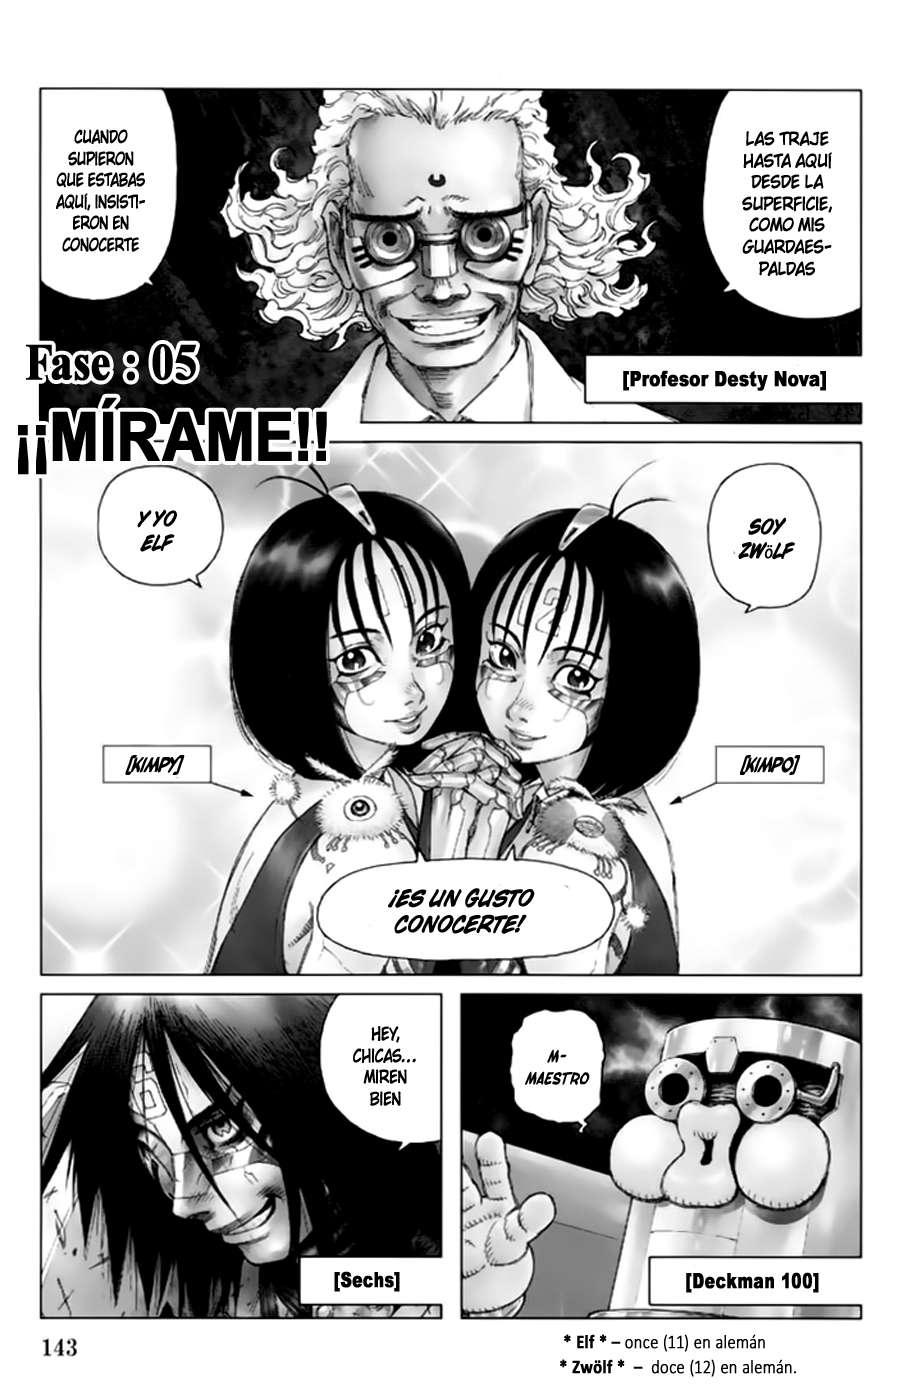 http://c5.ninemanga.com/es_manga/1/15873/379724/e626fbeea3ece898dfb0e5f651839d12.jpg Page 3